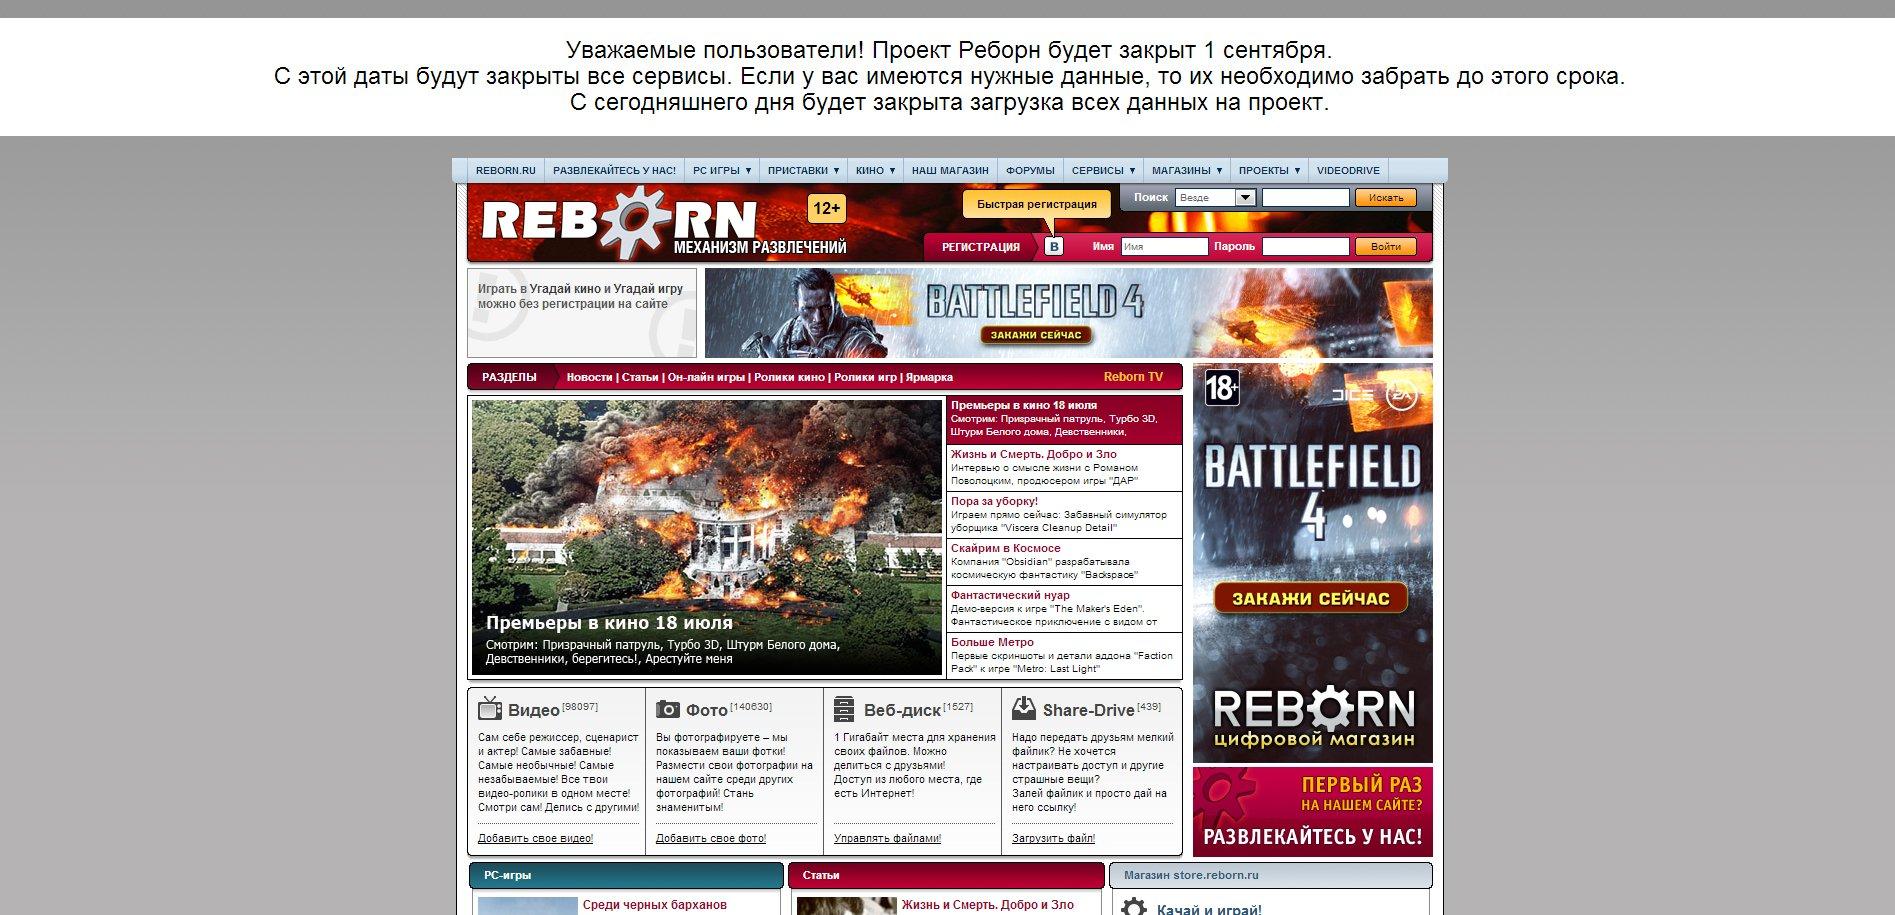 Hearst Shkulev digital закроет портал Reborn.ru - Изображение 1